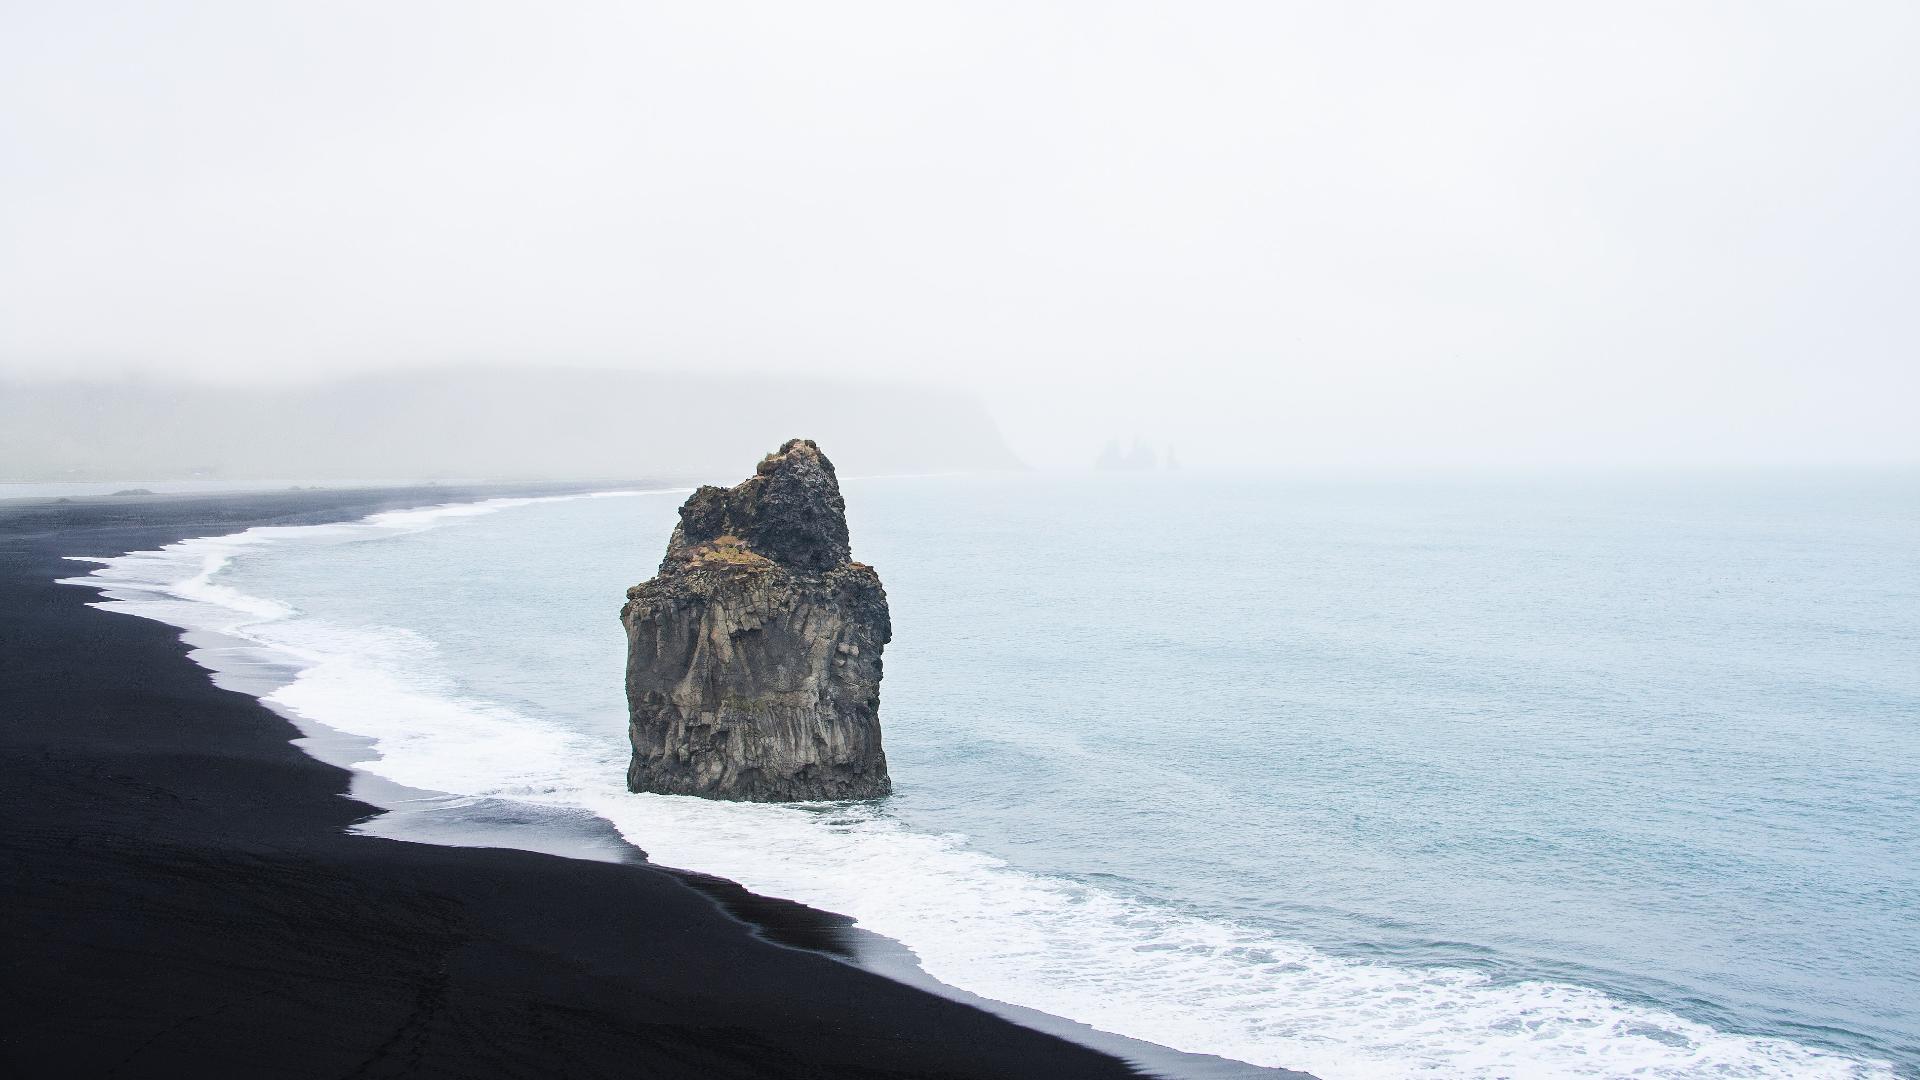 General 1920x1080 nature landscape coast beach water sea rocks island mist black sand vik Iceland